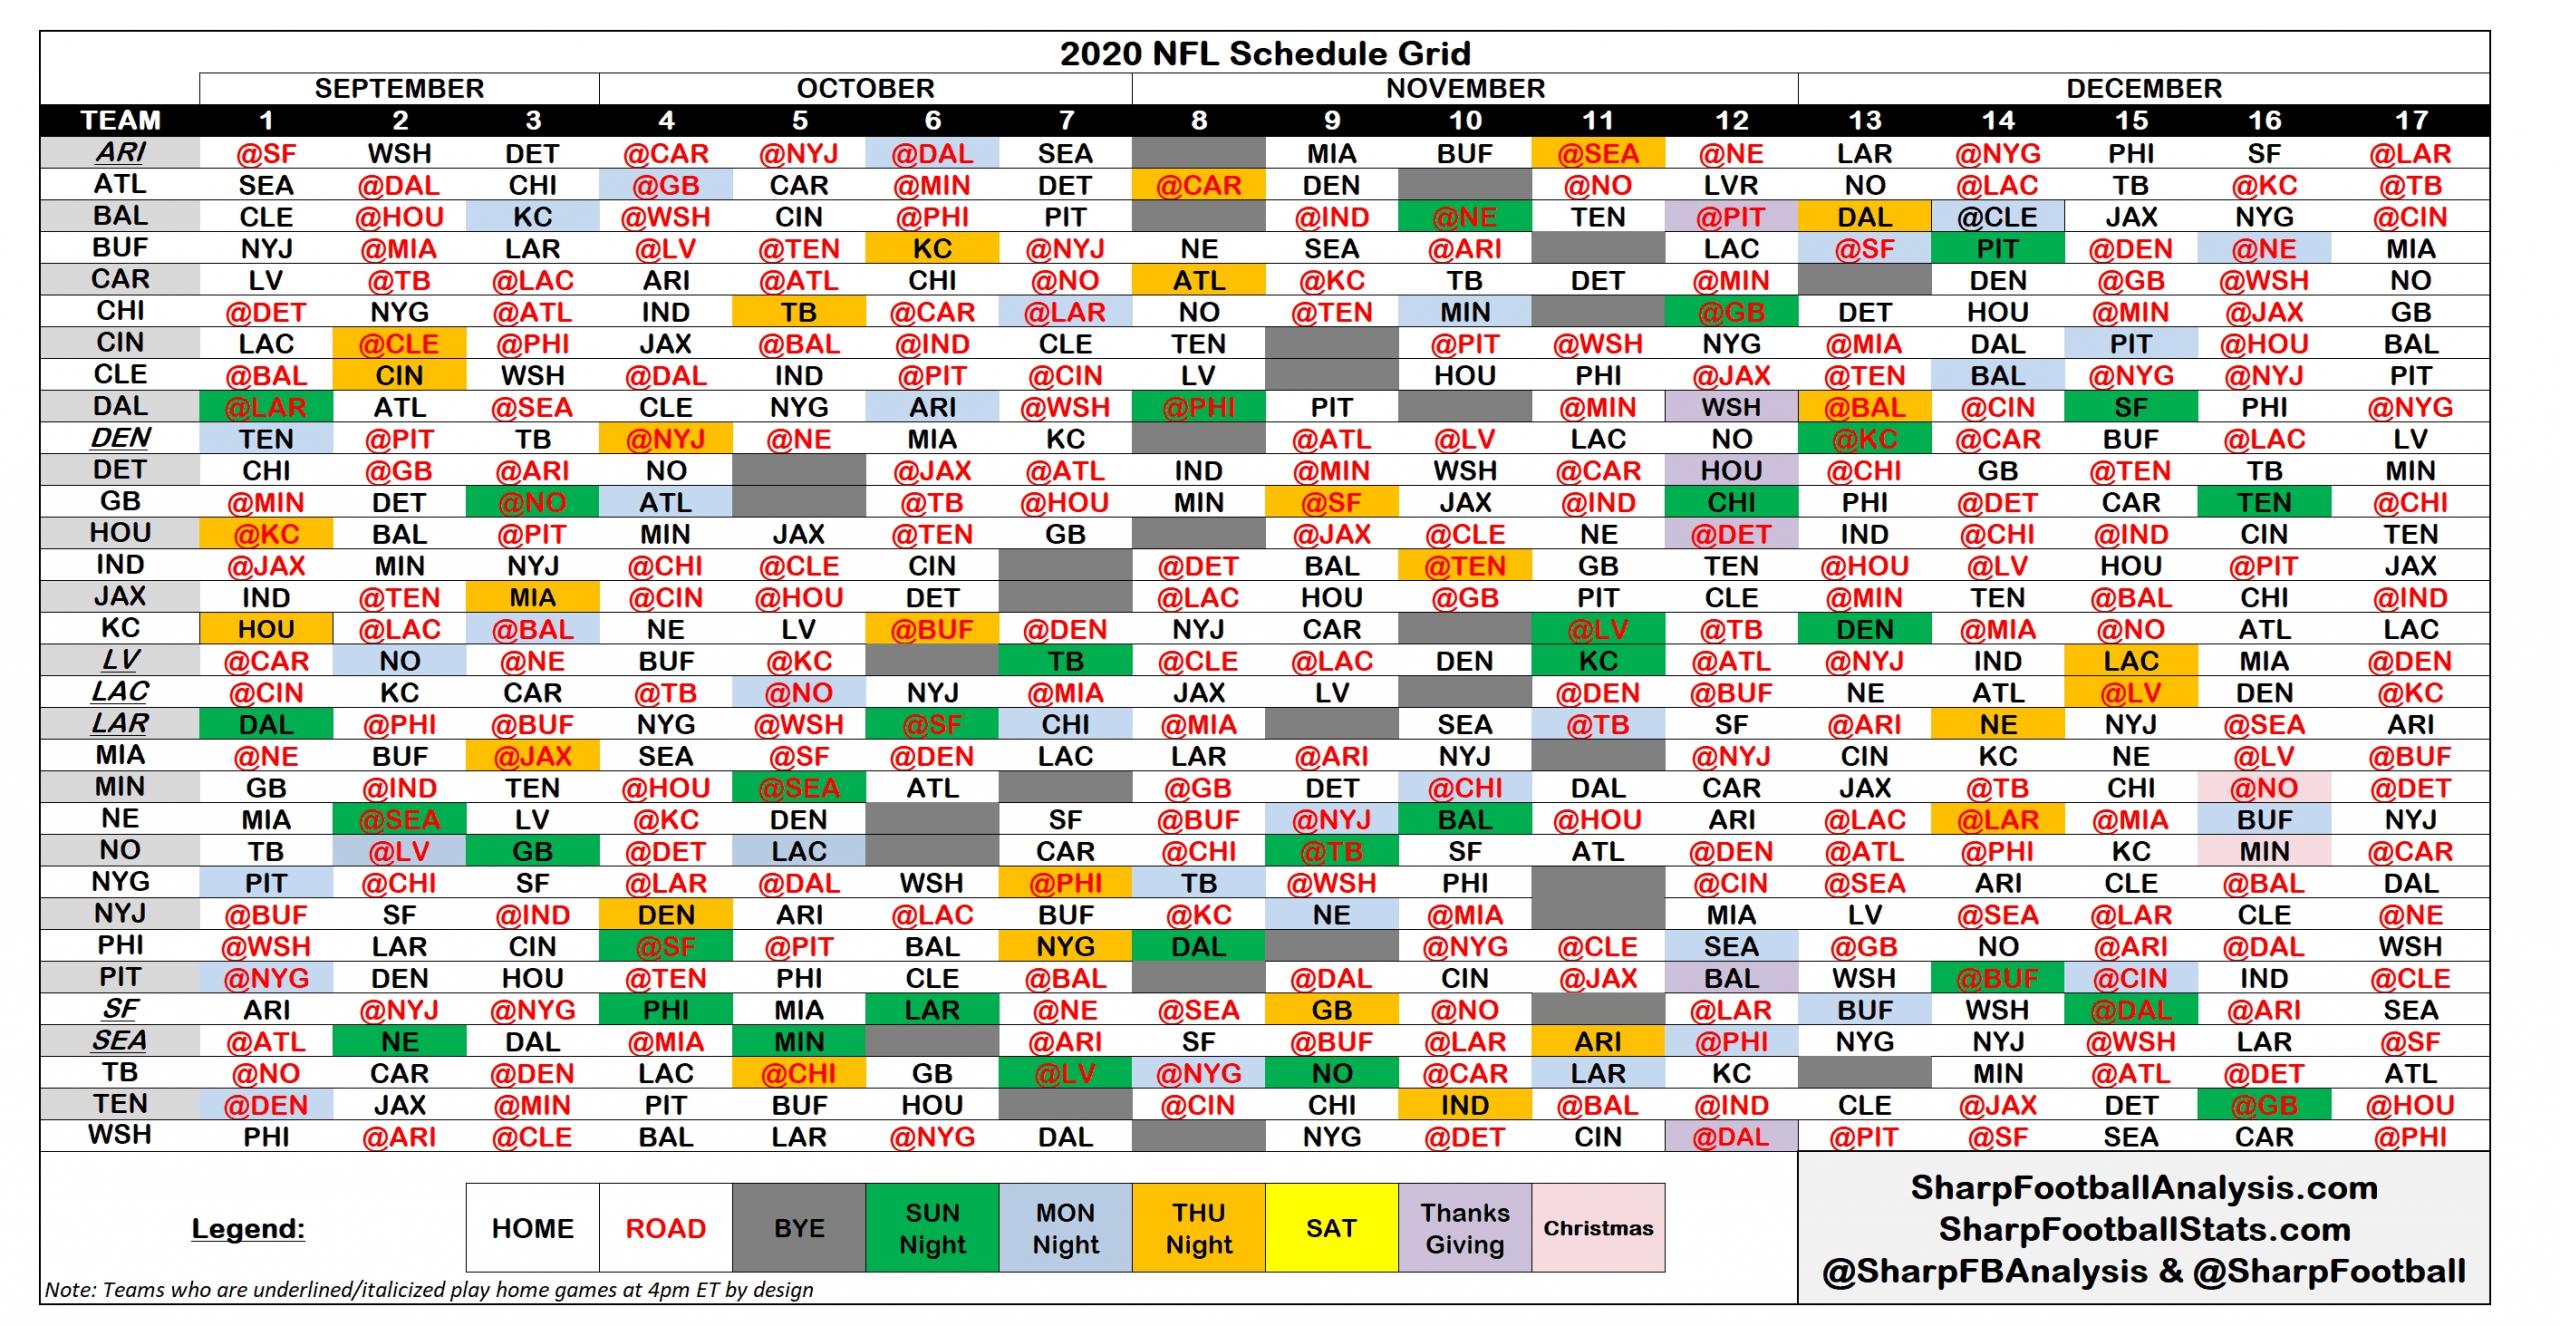 2020 Nfl Regular Season Schedule Grid & Strength Of Schedule intended for Nfl Schedule 2019 2020 Season Calendar